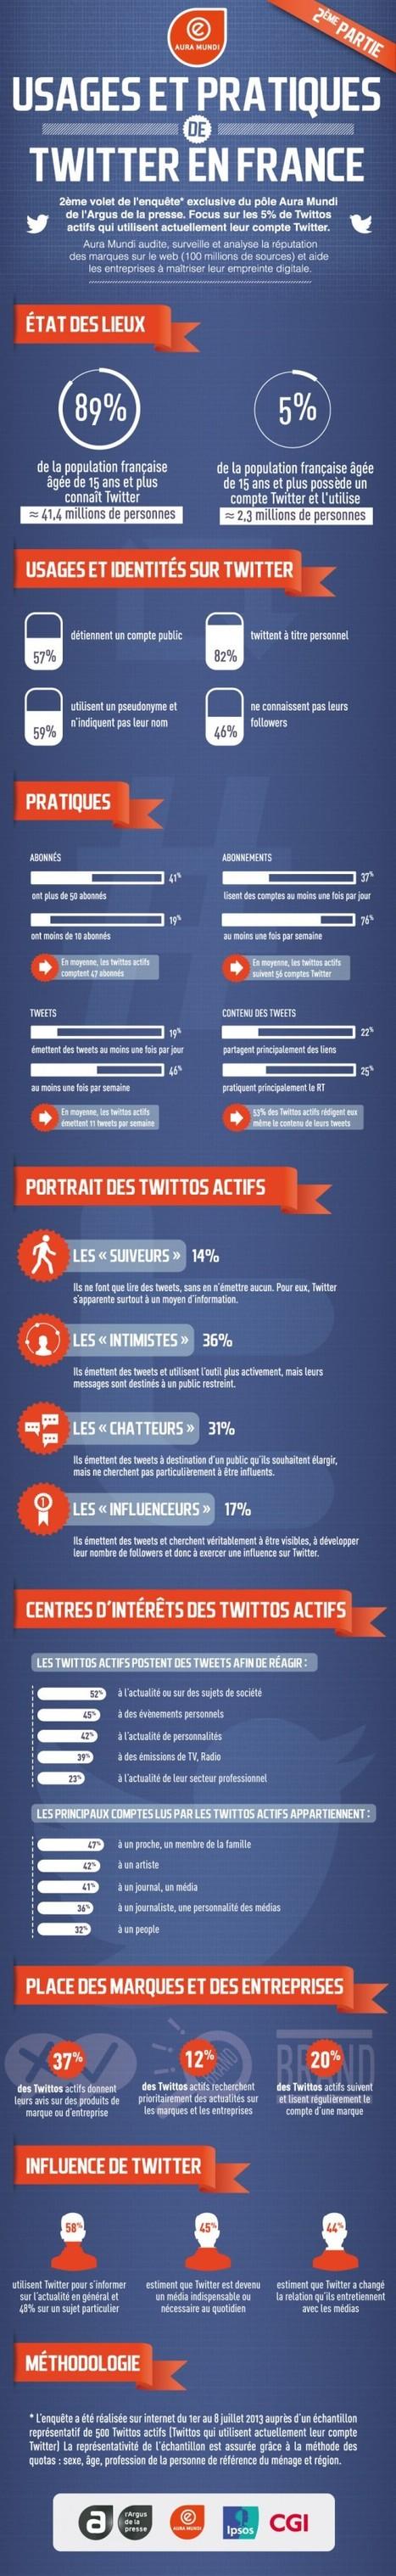 Profil et usages des utilisateurs Twitter en France   Infographies social media   Scoop.it